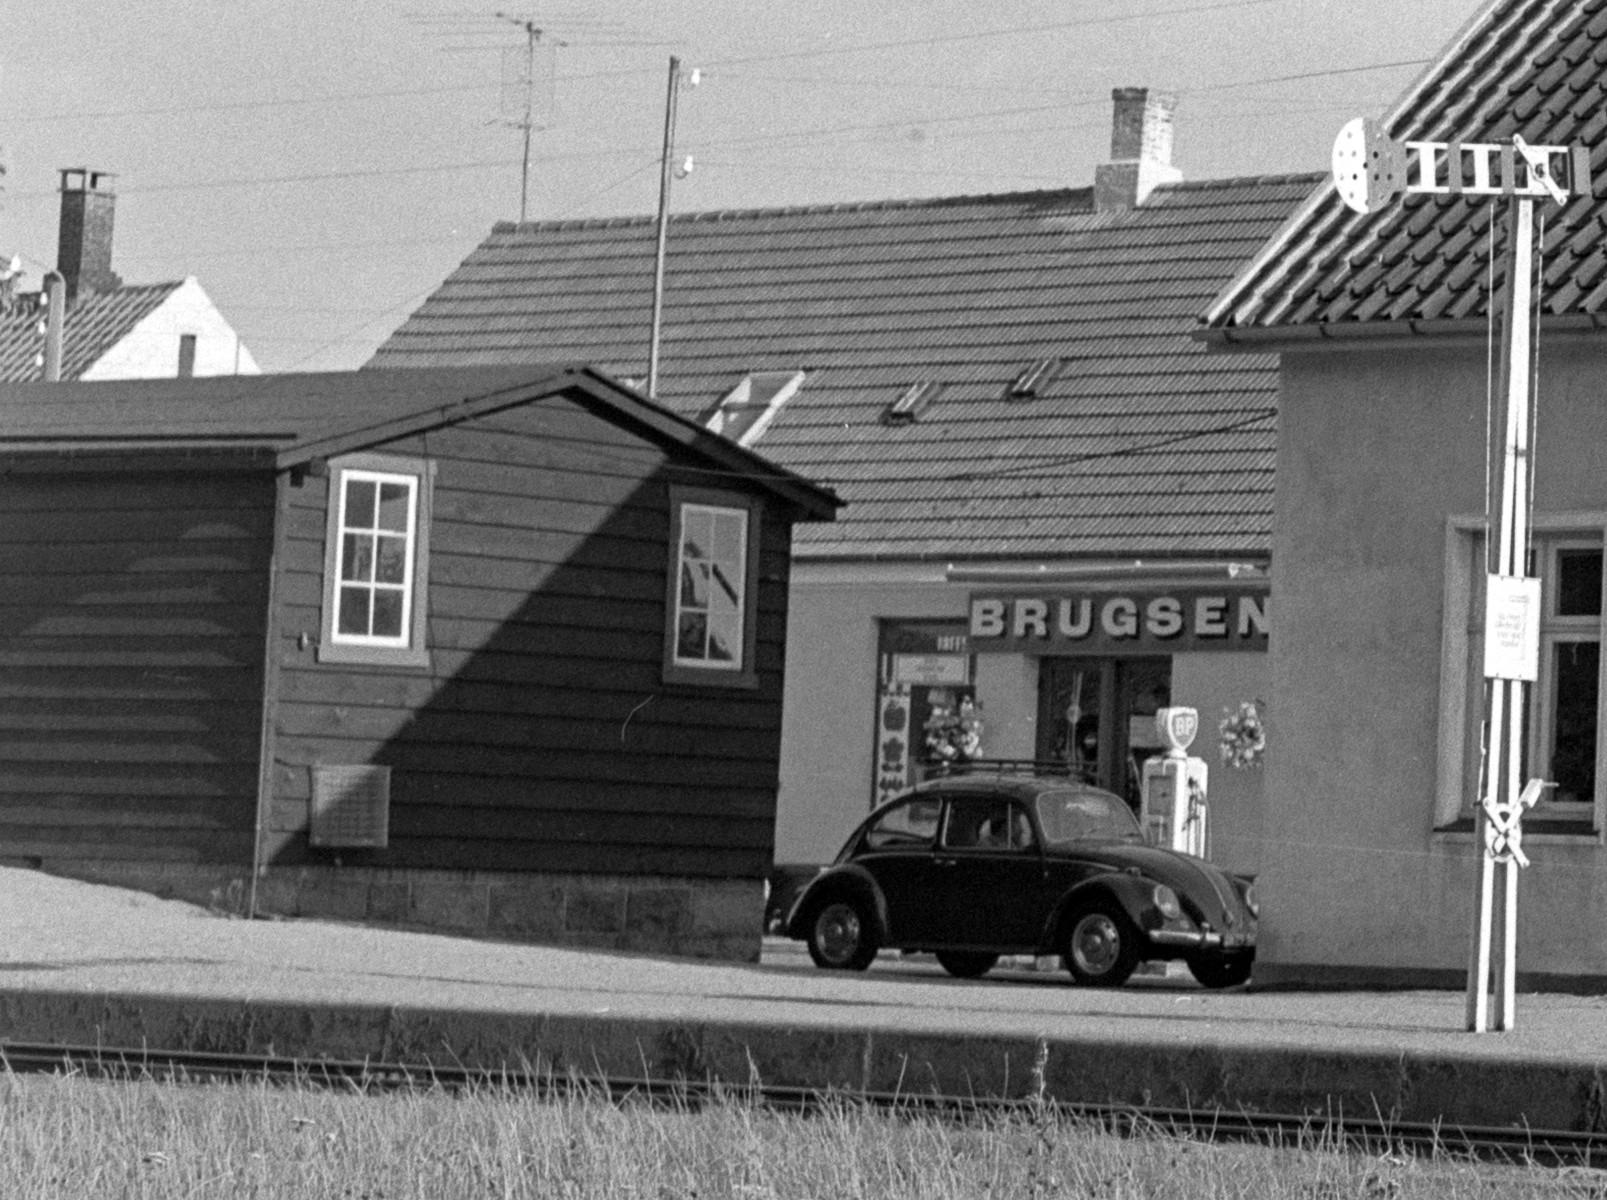 Lobbæk Brugsforening samt BP stander skimtes bag Lobbæk Station - 1968